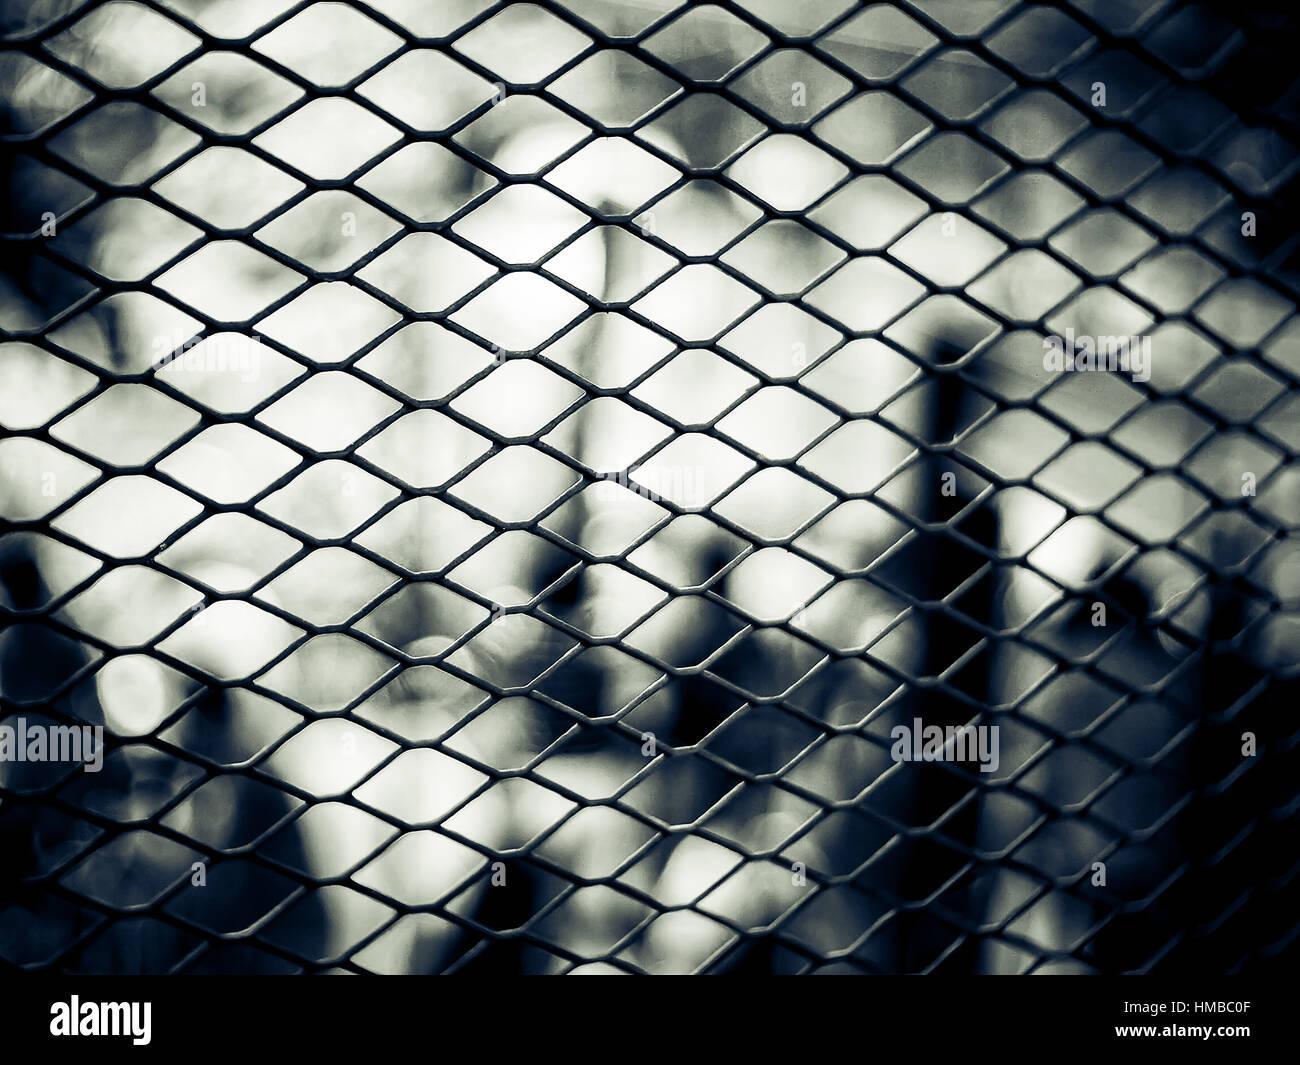 Fence Crisscross Stockfotos & Fence Crisscross Bilder - Alamy